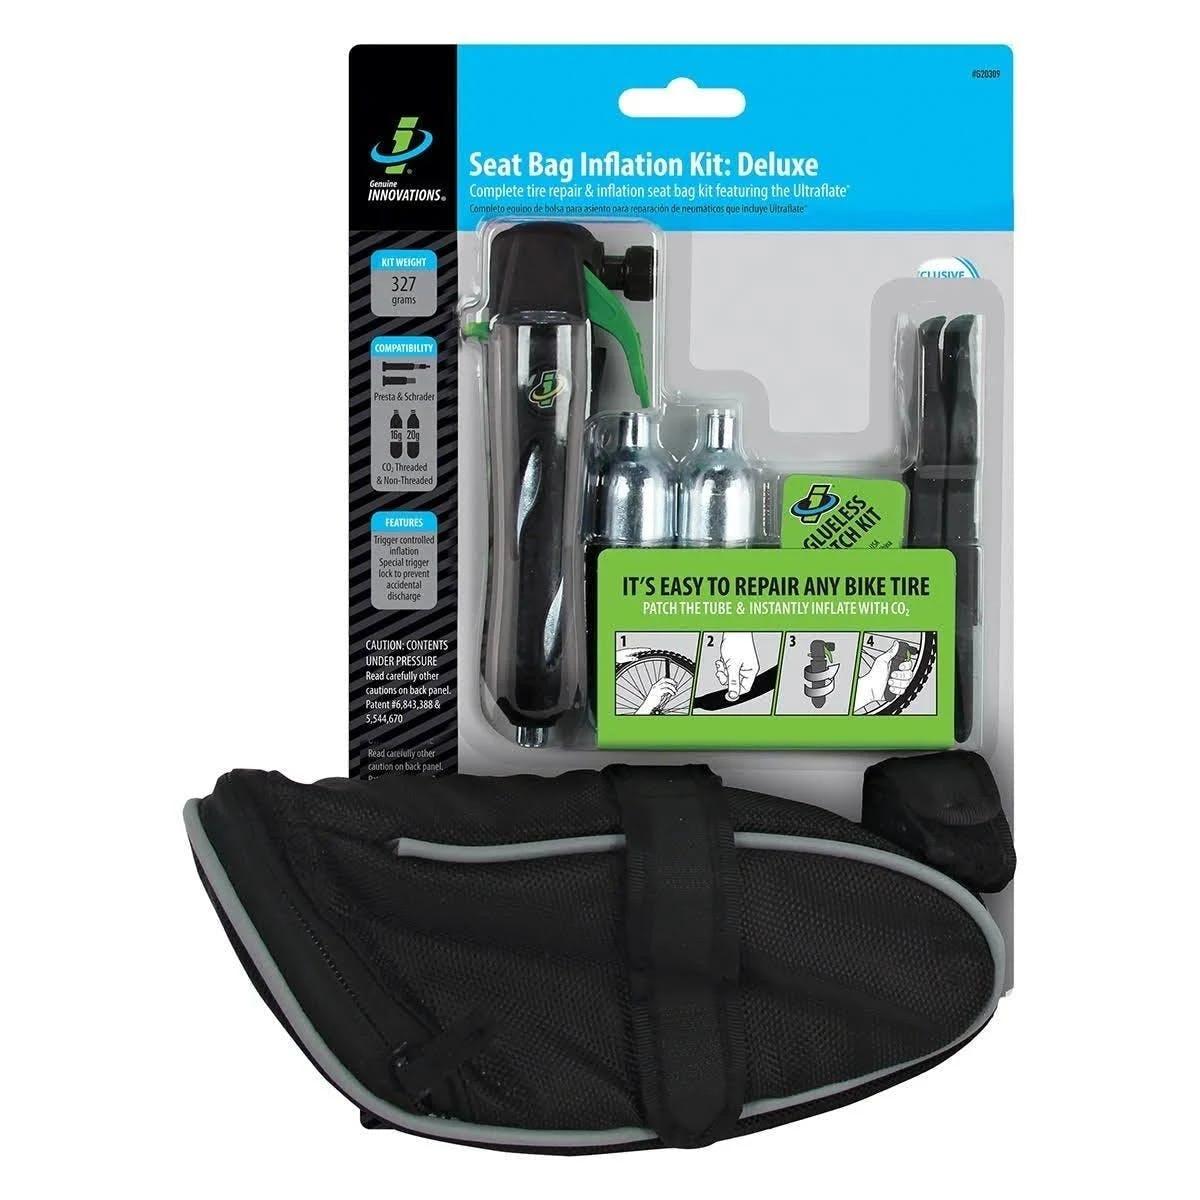 Genuine Innovations Deluxe Seat Bag Repair & Inflation Kit